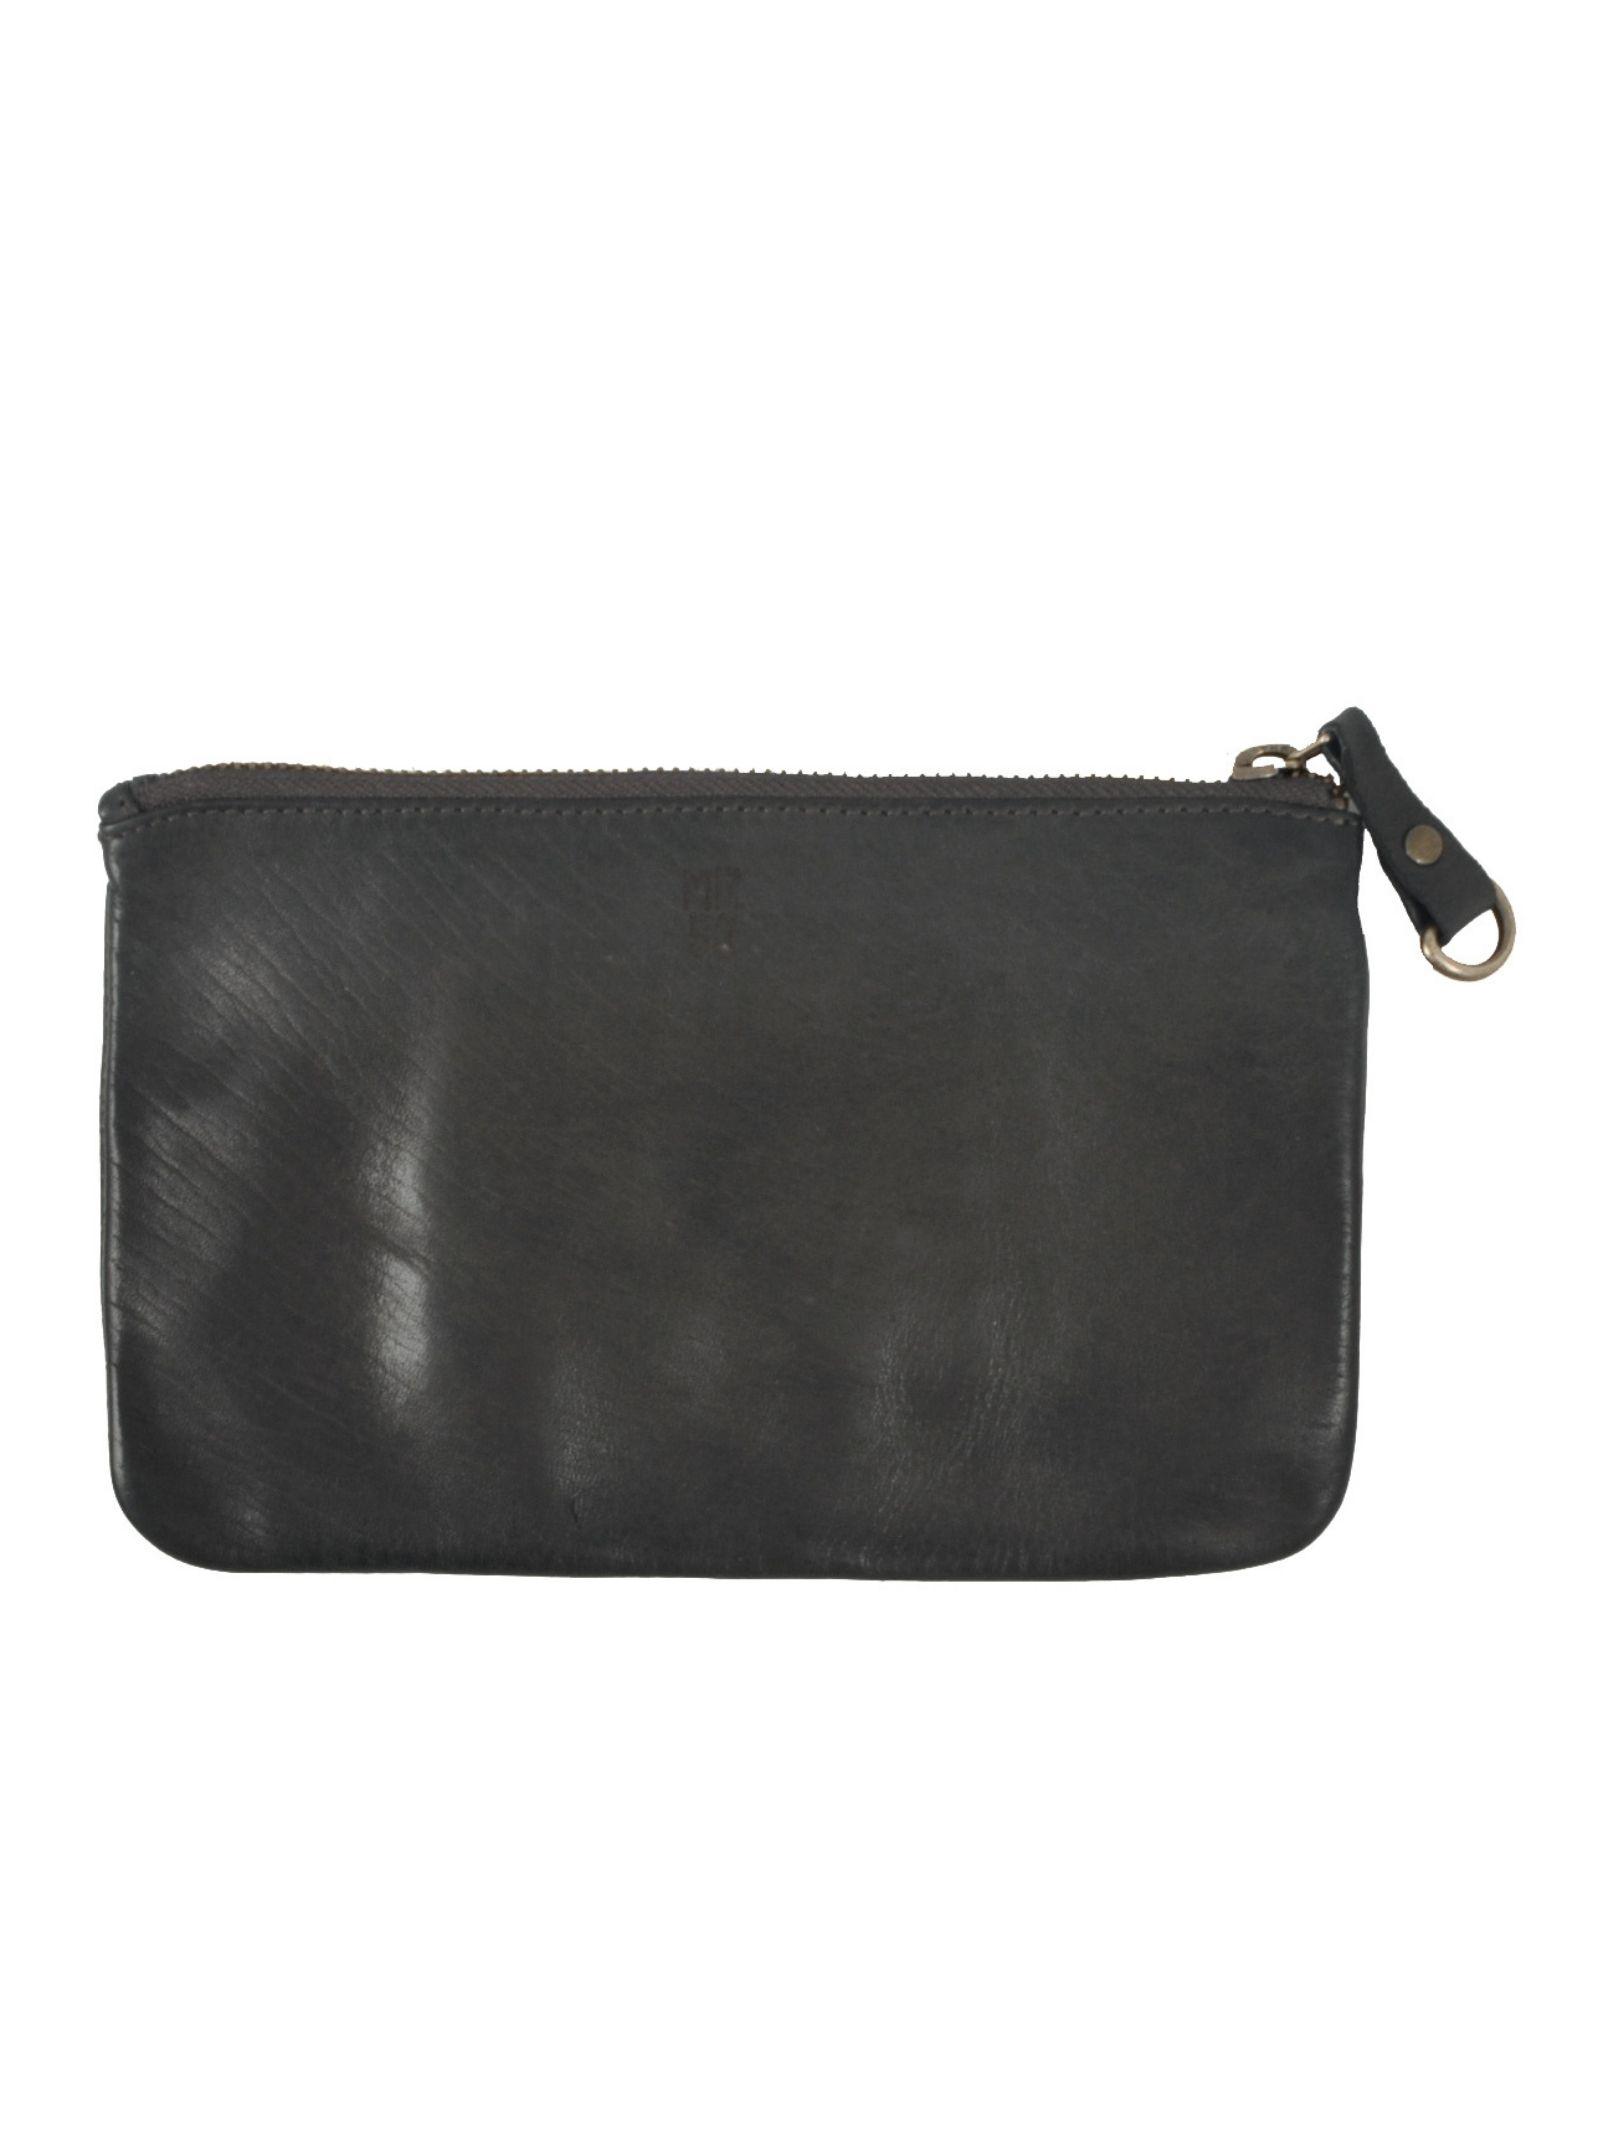 Minoronzoni   Bags and backpacks   MRF192P152C99